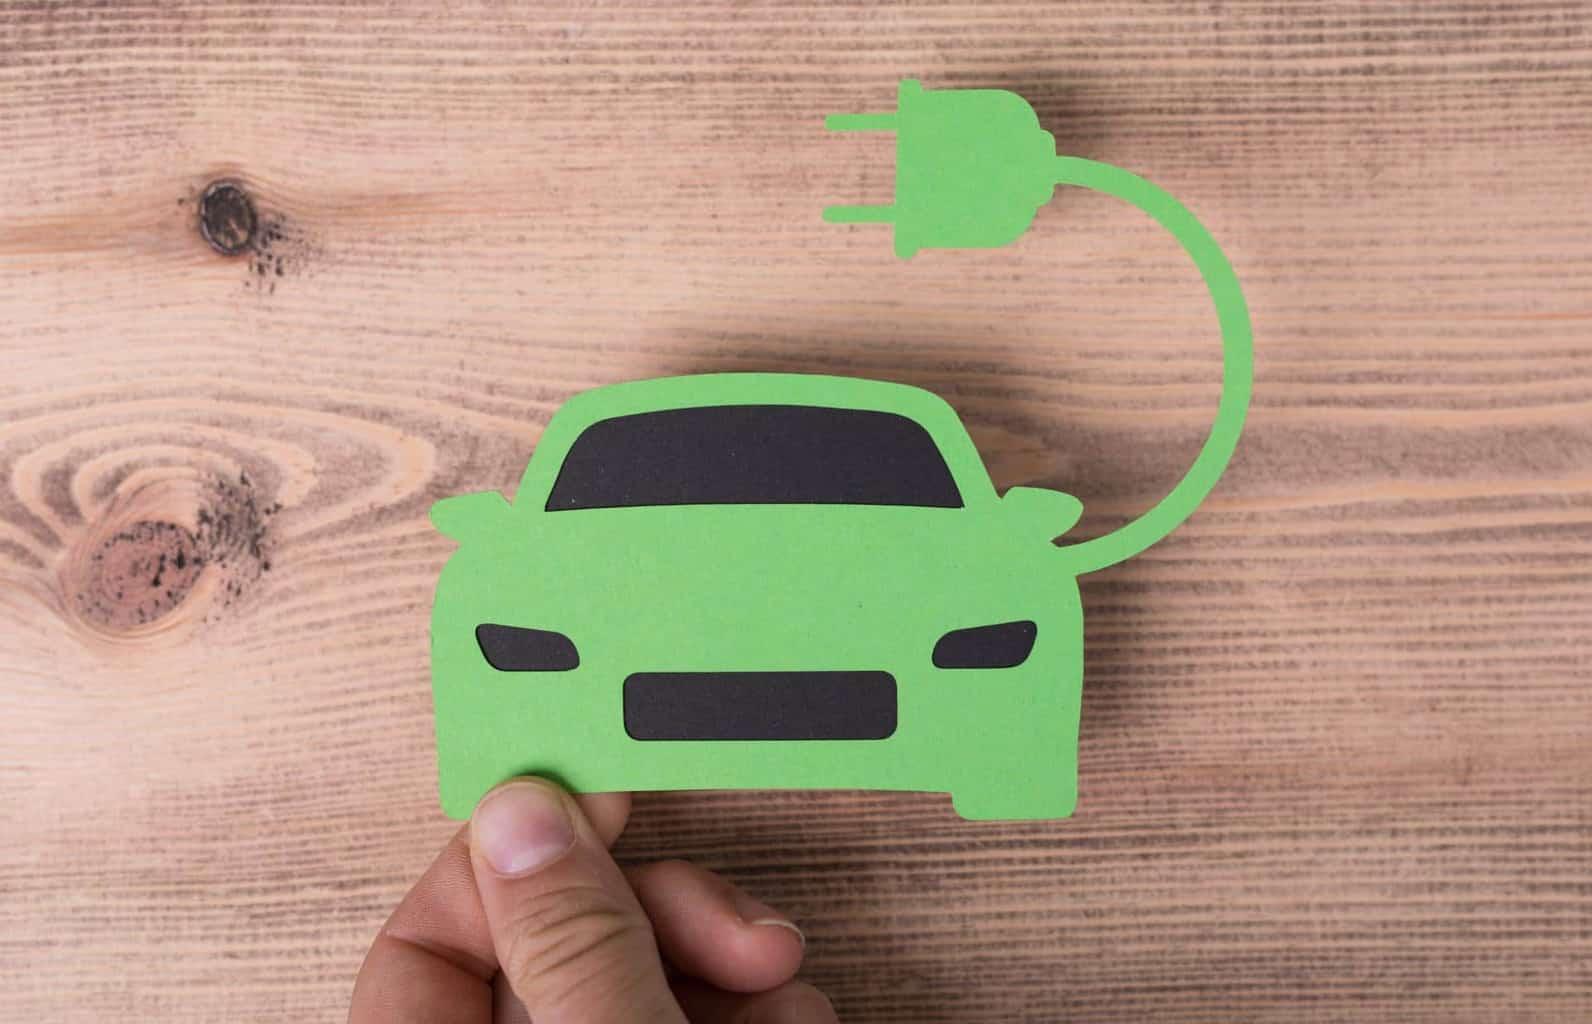 Fast 20.000 Anträge auf E-Auto-Kaufprämie / Umweltbonus im Juli